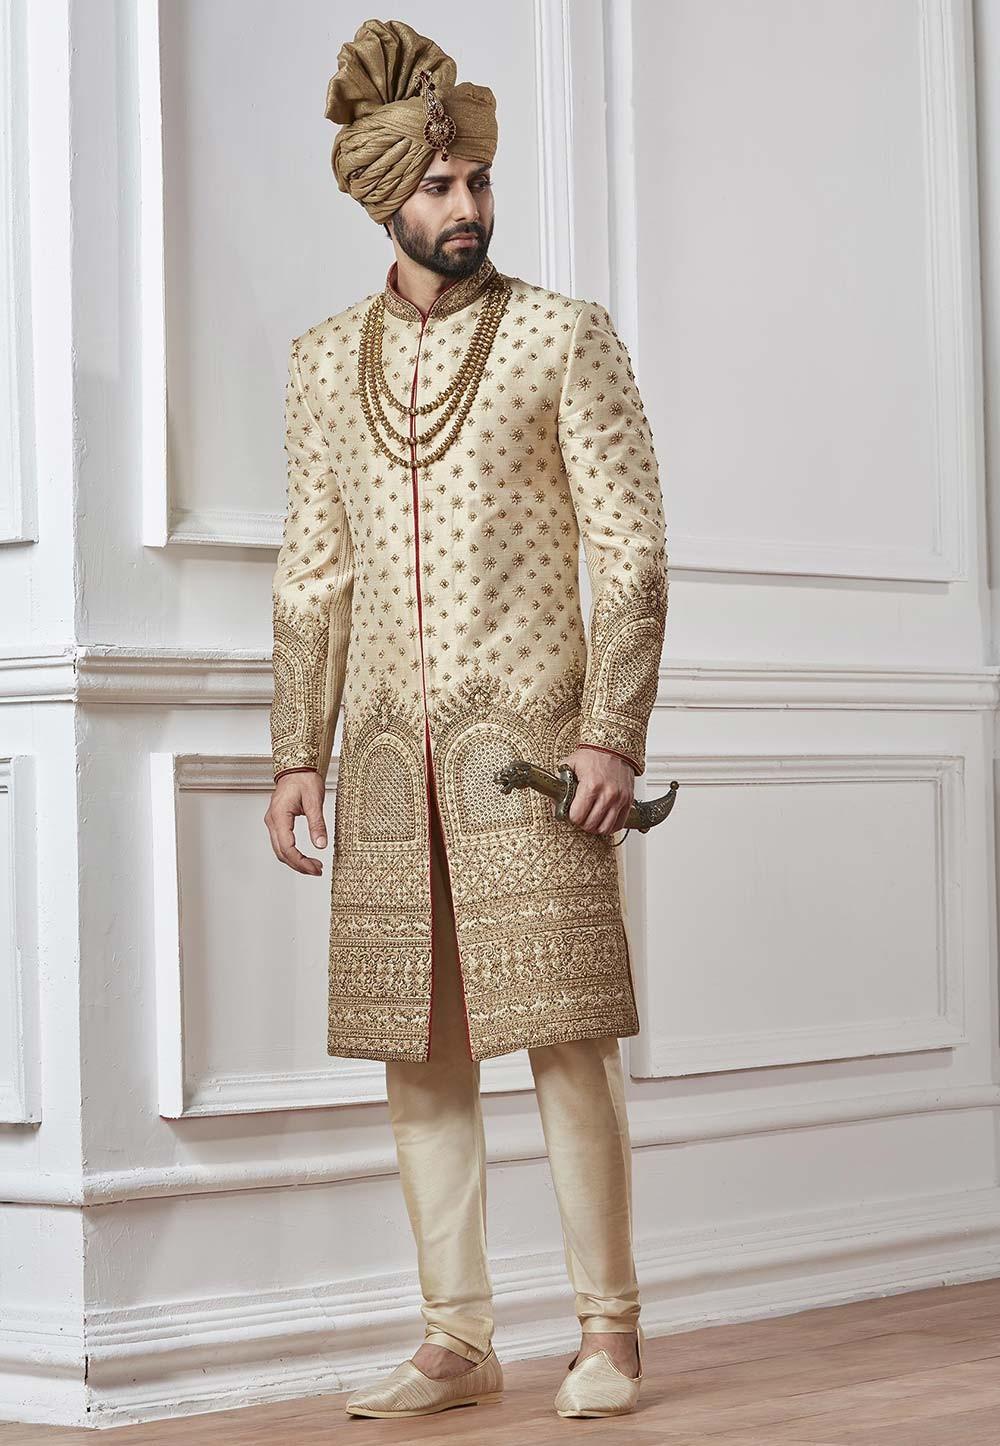 Buy desinger sherwani in Cream,Golden Color Indian style